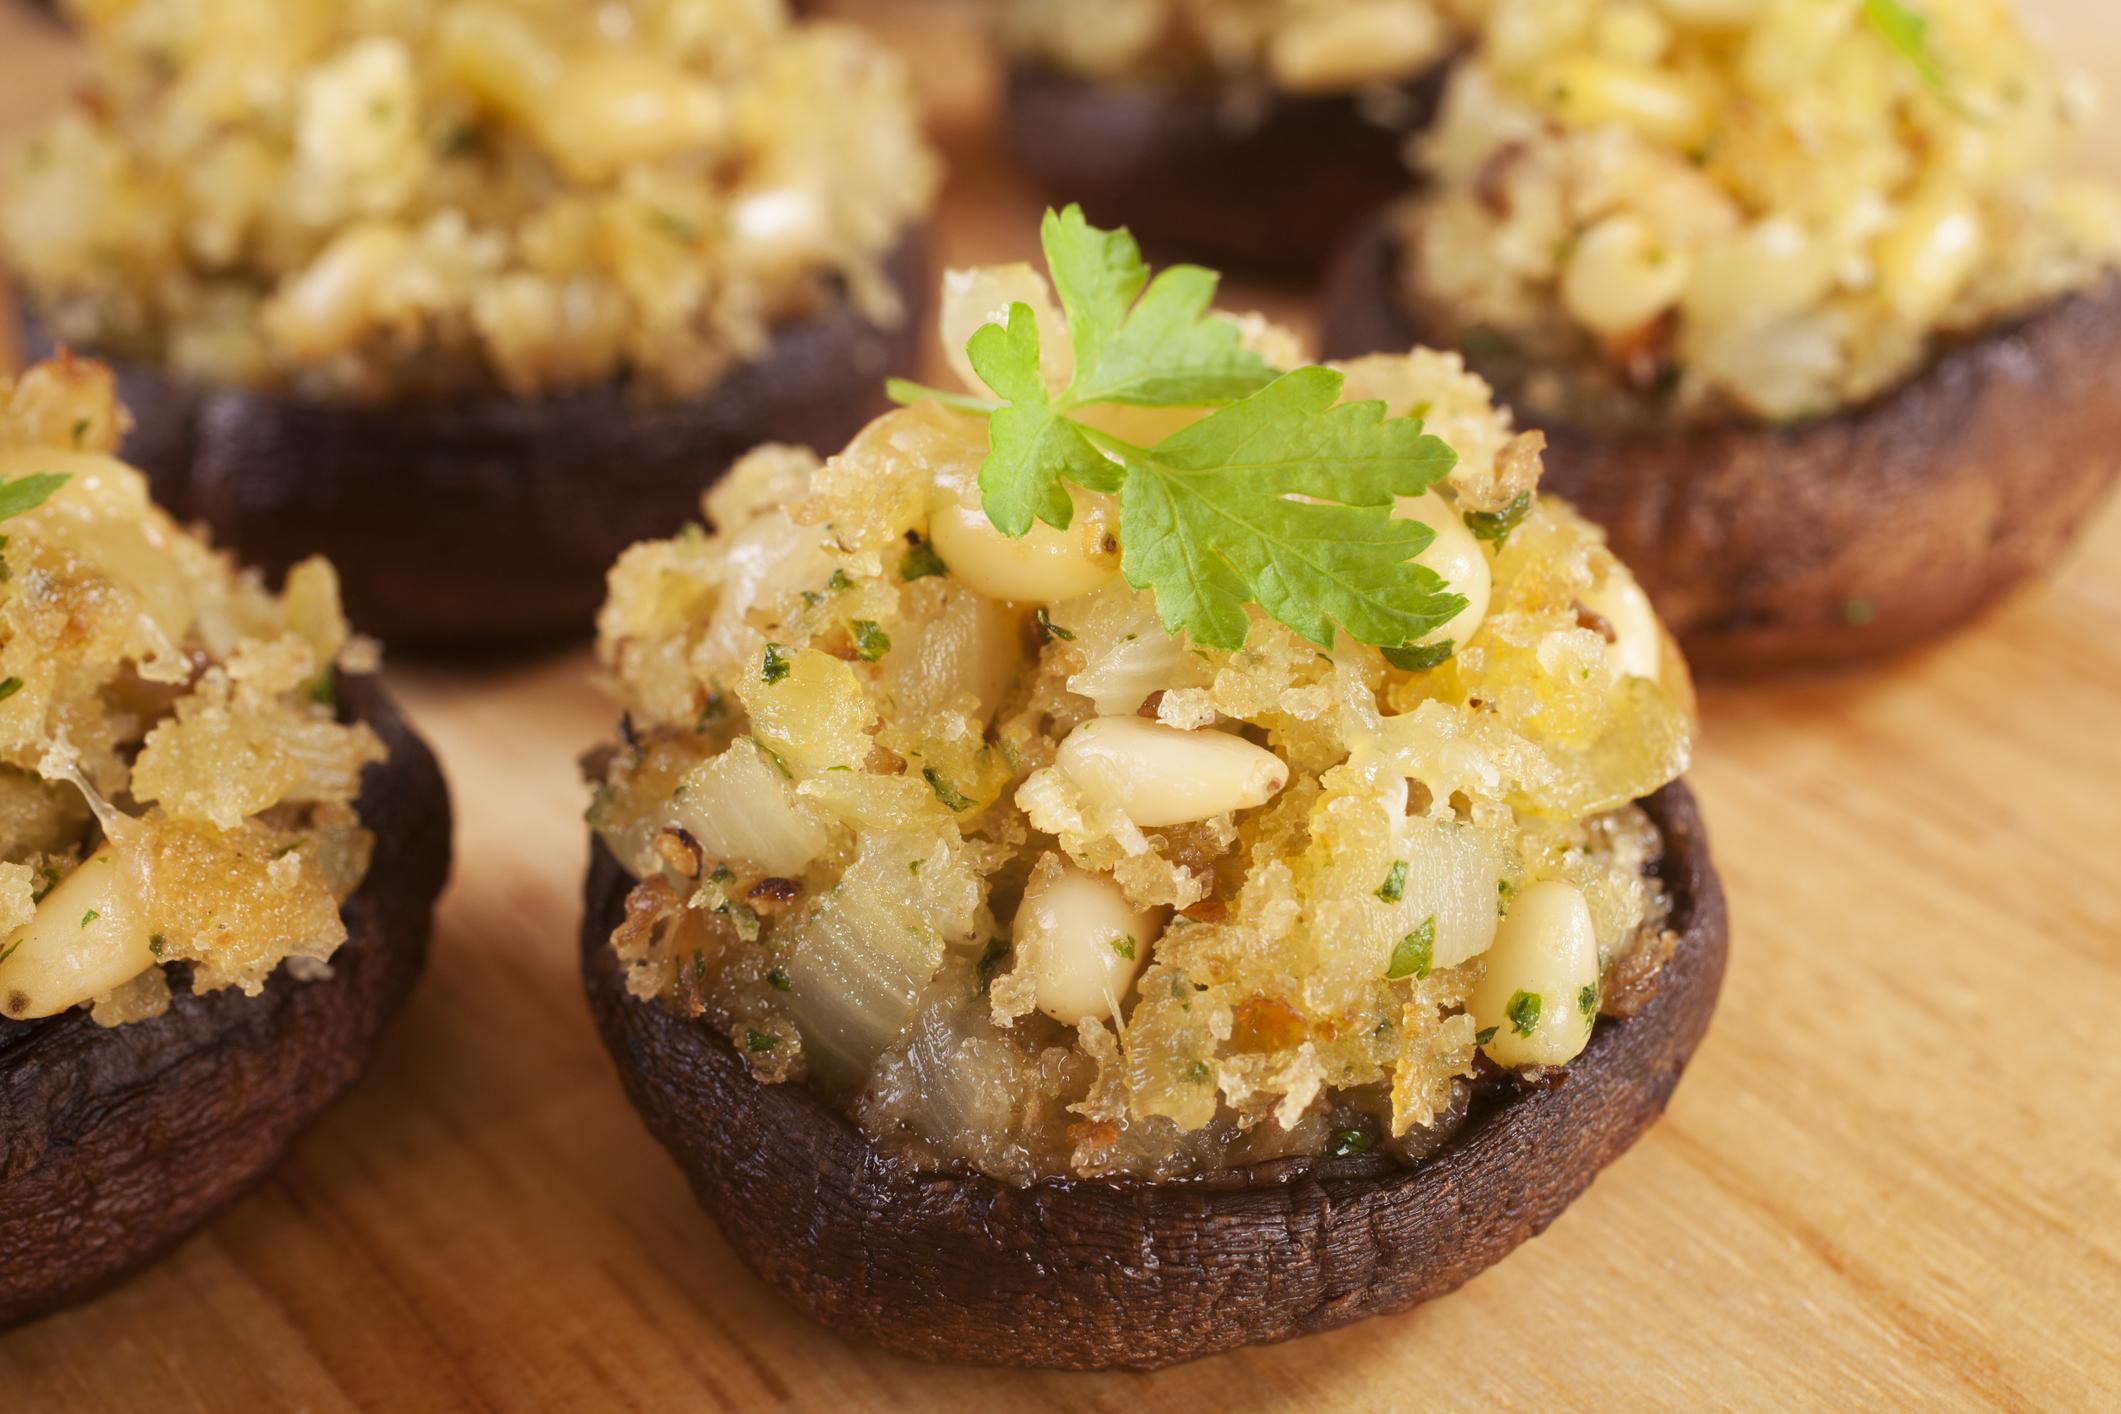 Meal Makeover: Vegan Stuffed Portabella Mushroom